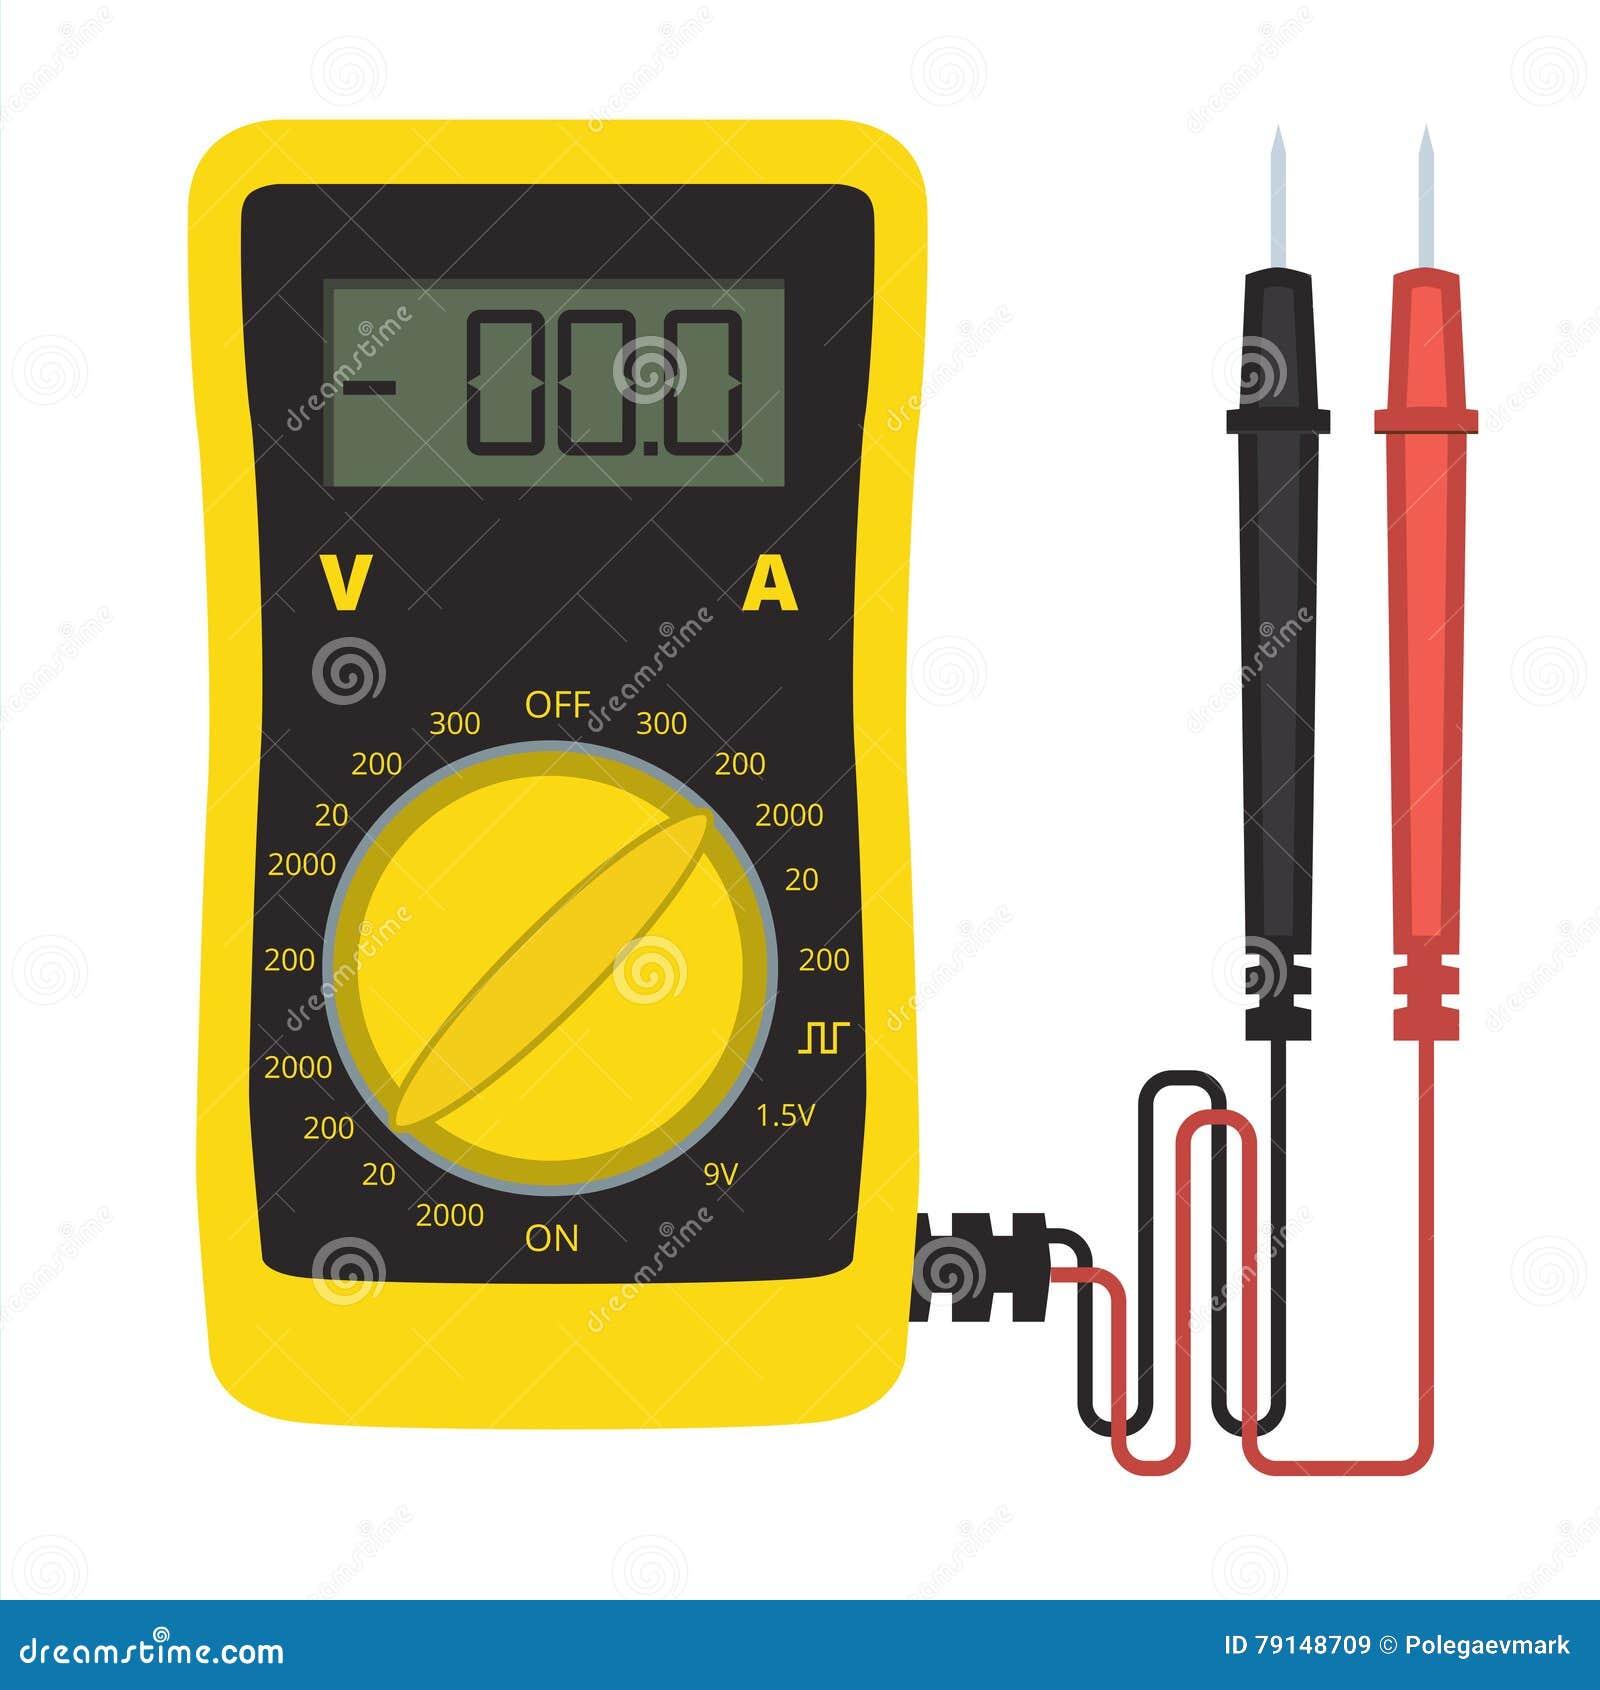 Power Meter Cartoon : Ammeter cartoons illustrations vector stock images